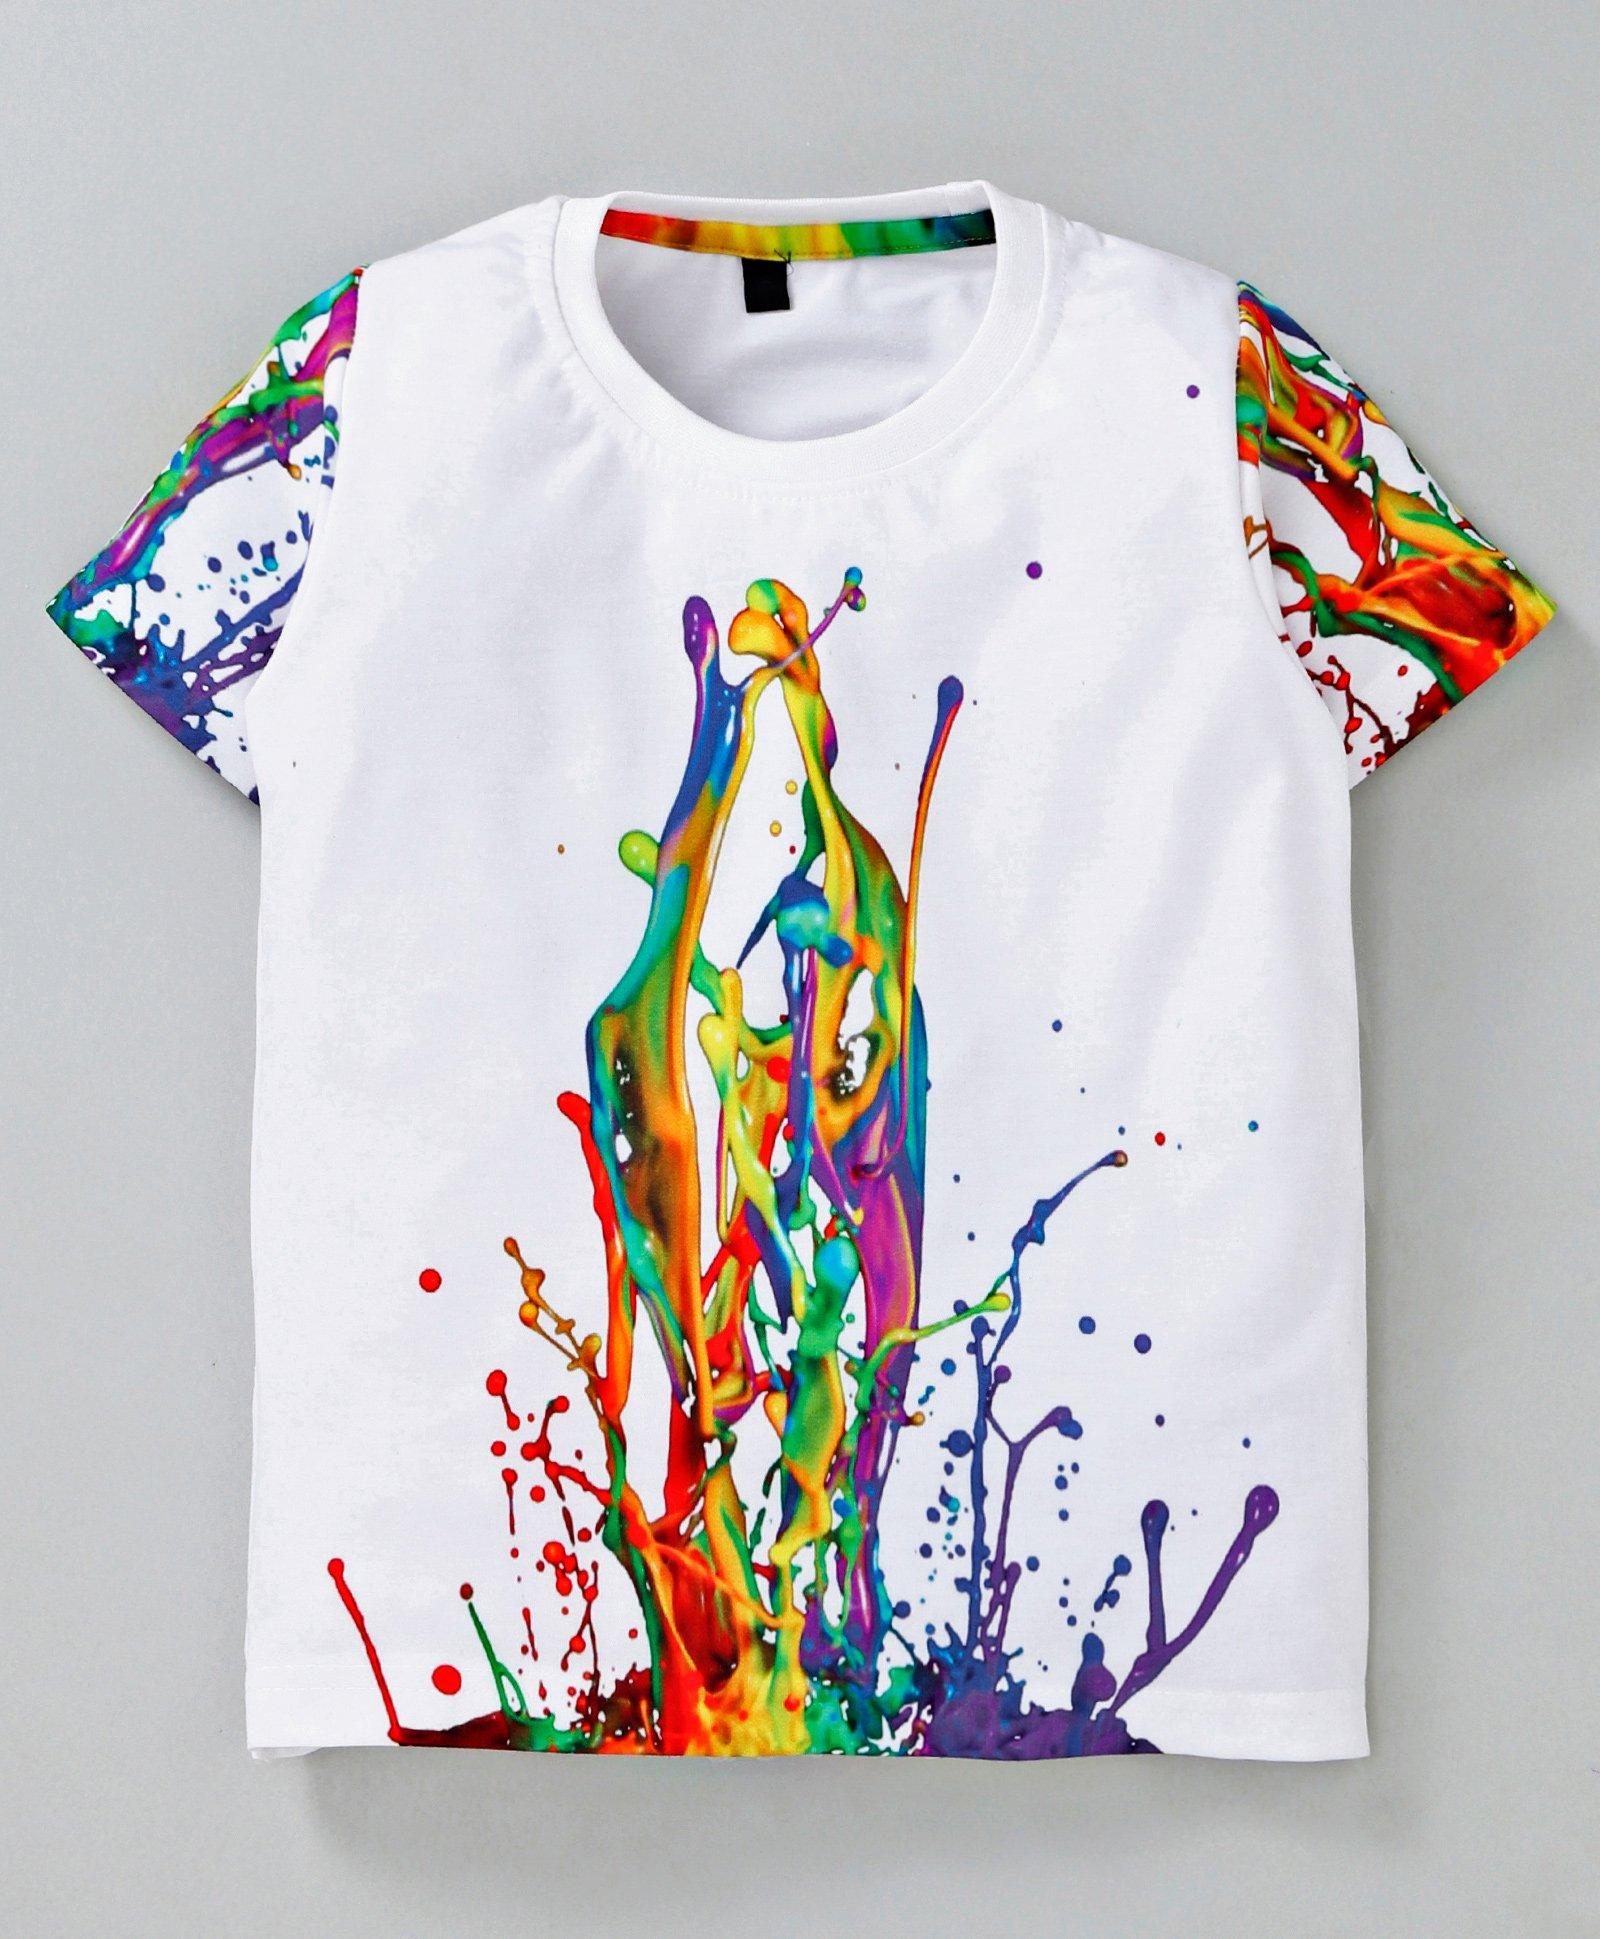 658892e3 Amigos Abstract Color Spash Printed Half Sleeves T-Shirt - White